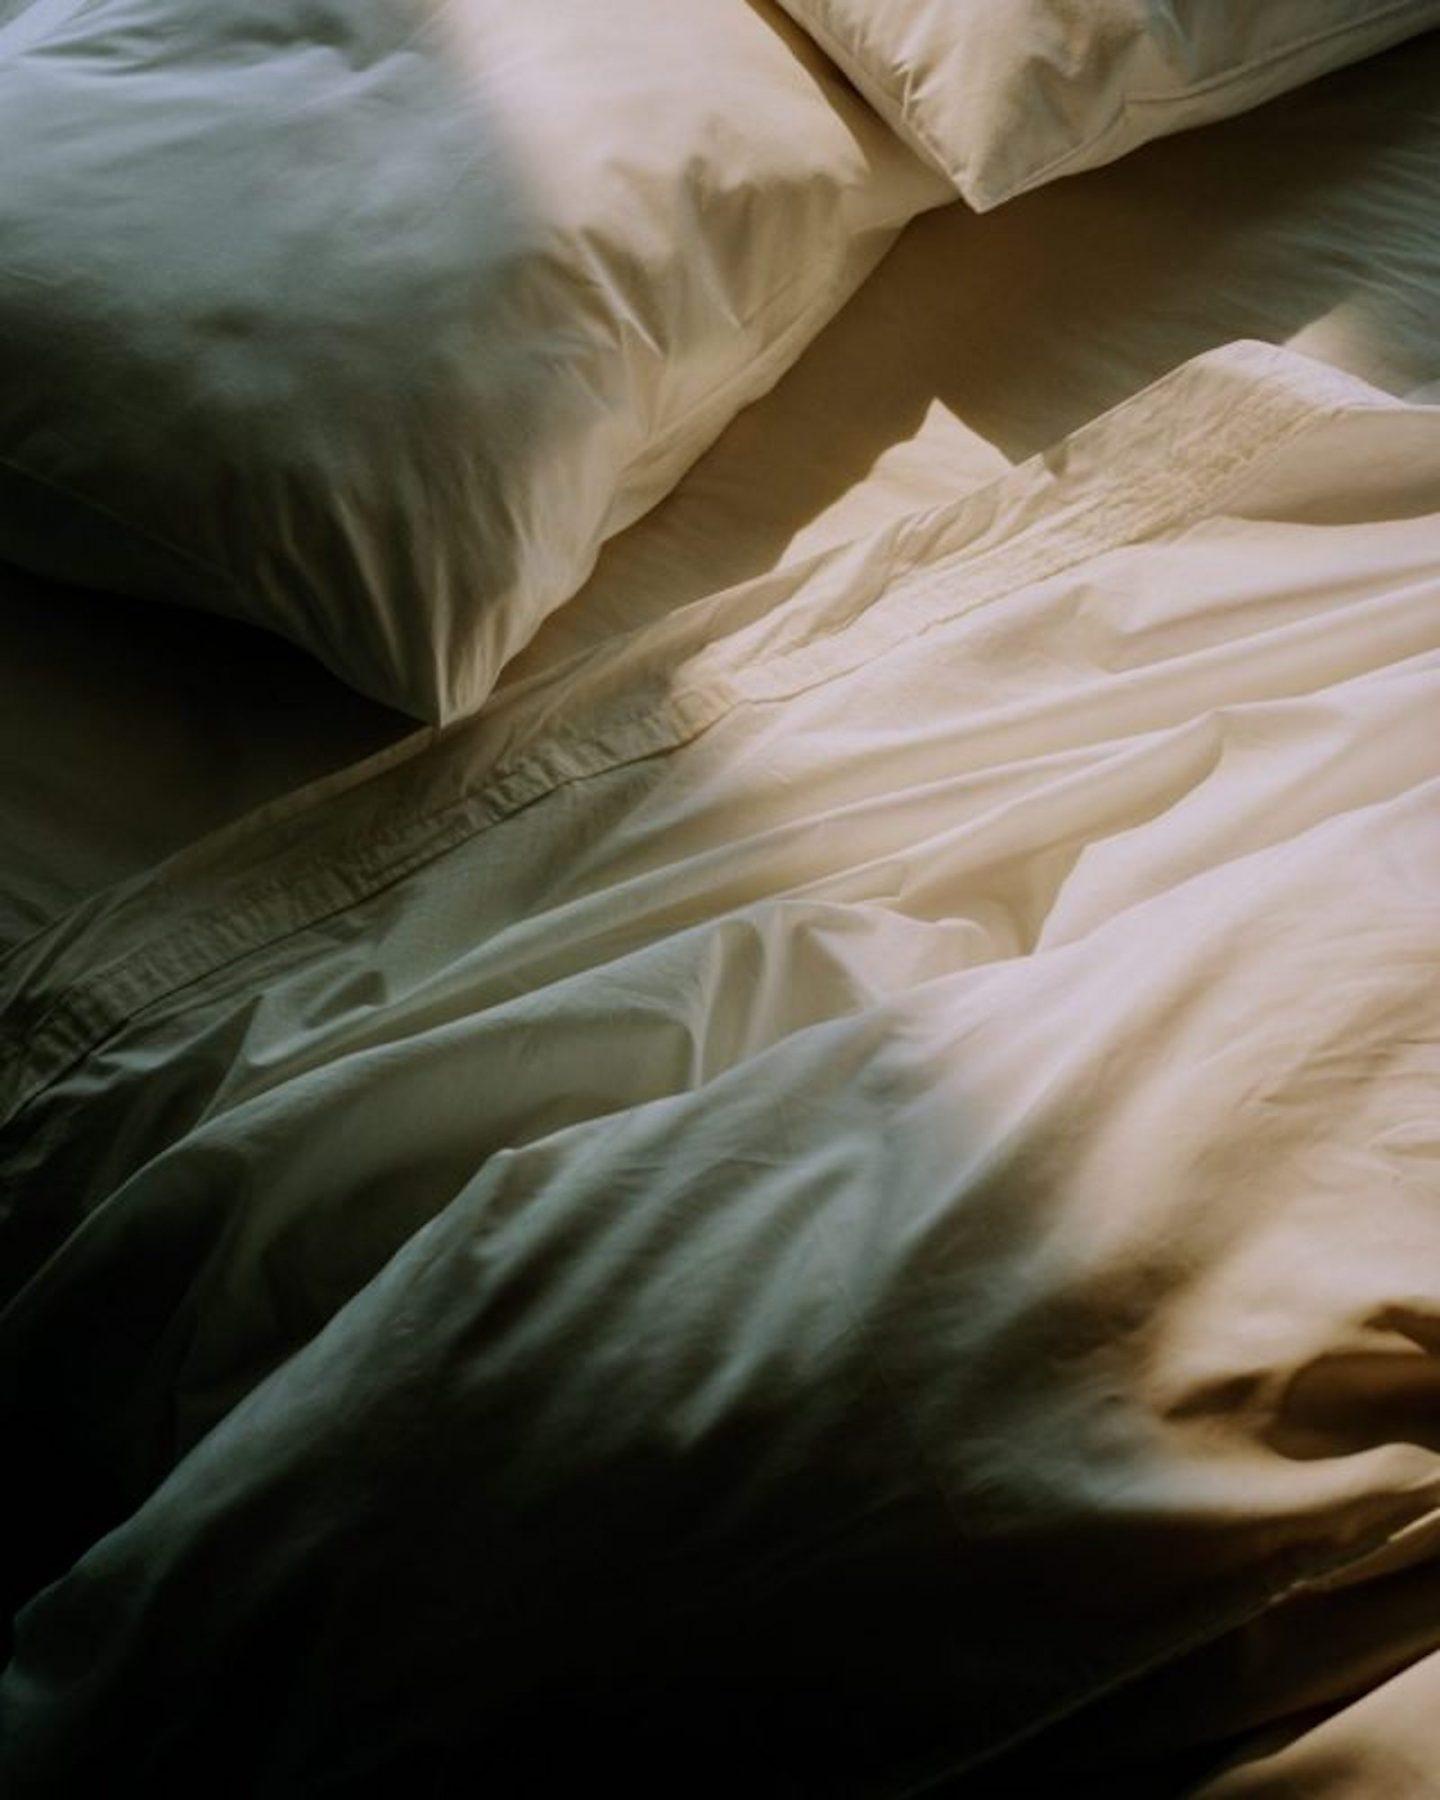 IGNANT-Photography-Ryan-Jenq-09